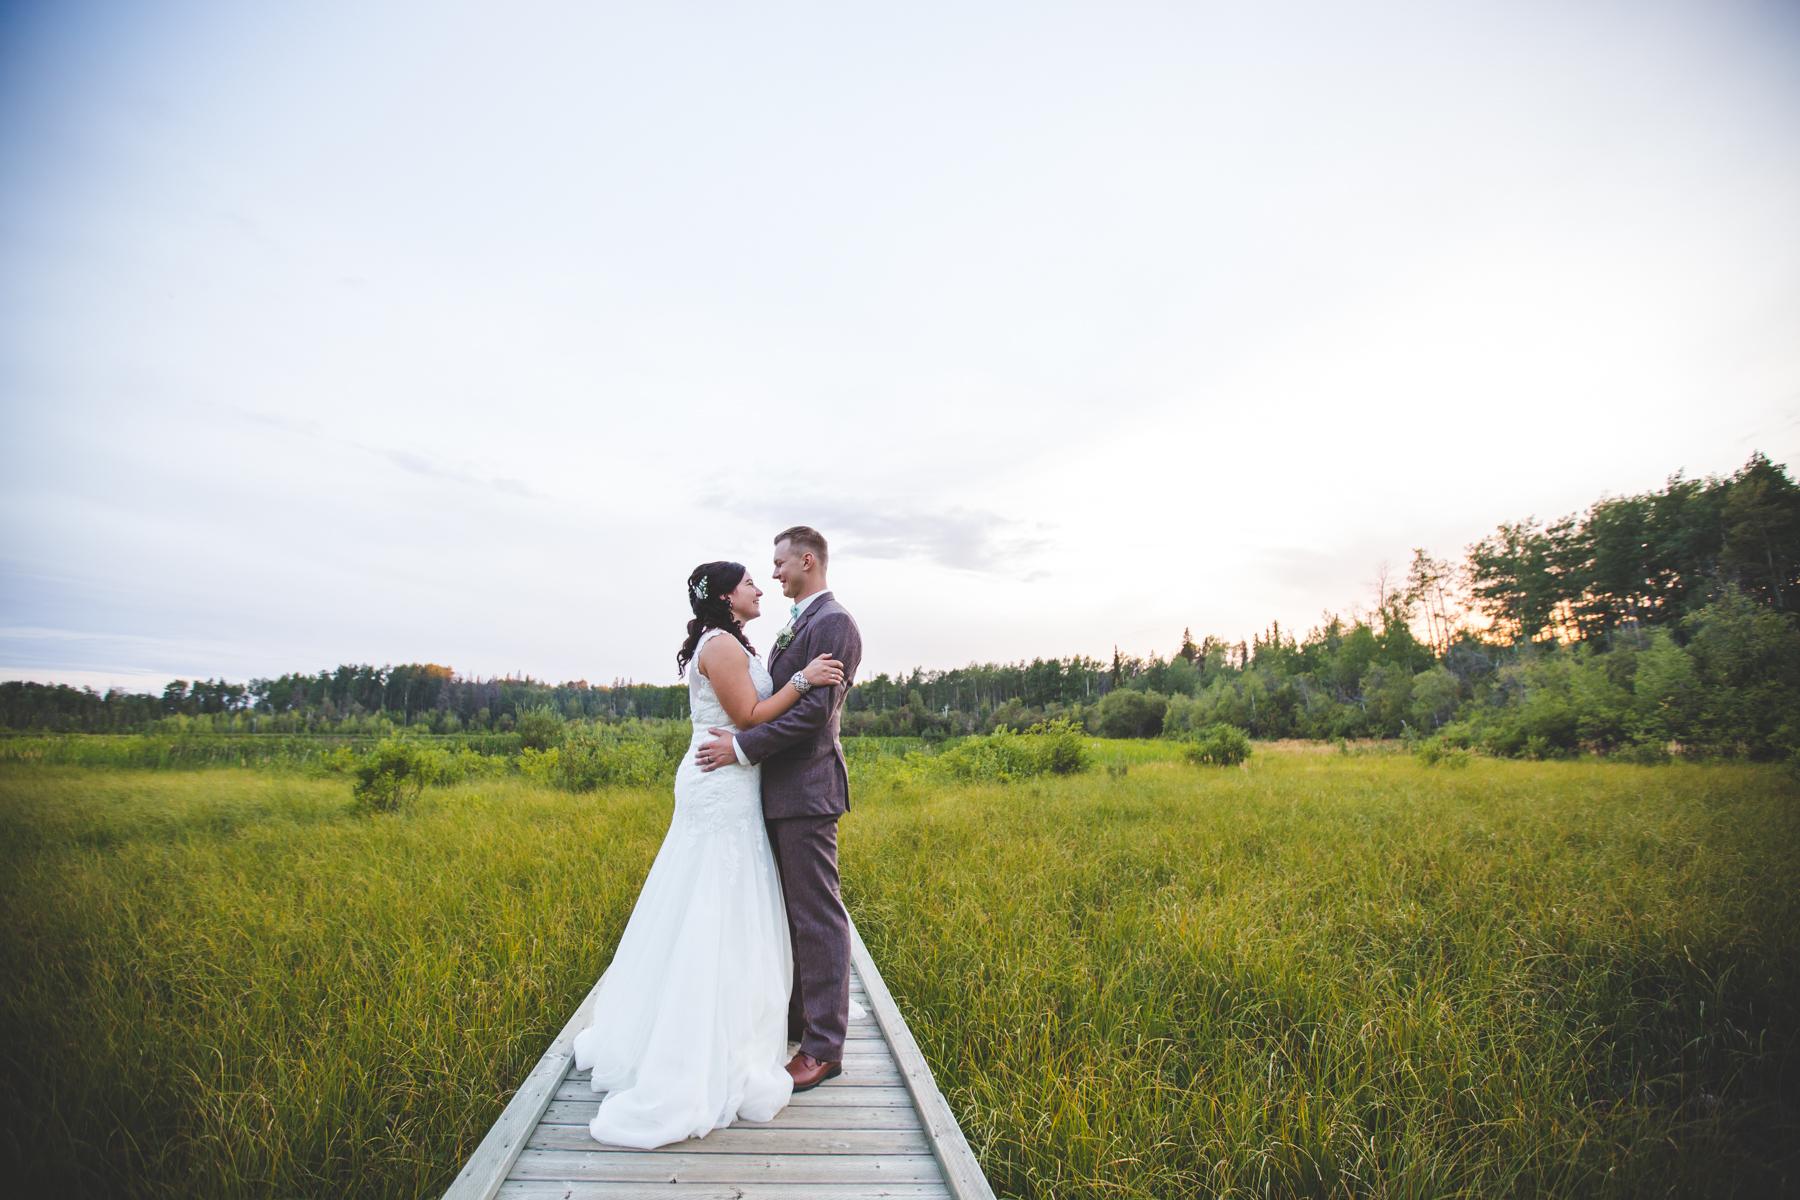 20150808-oglovewedding2-484.jpg